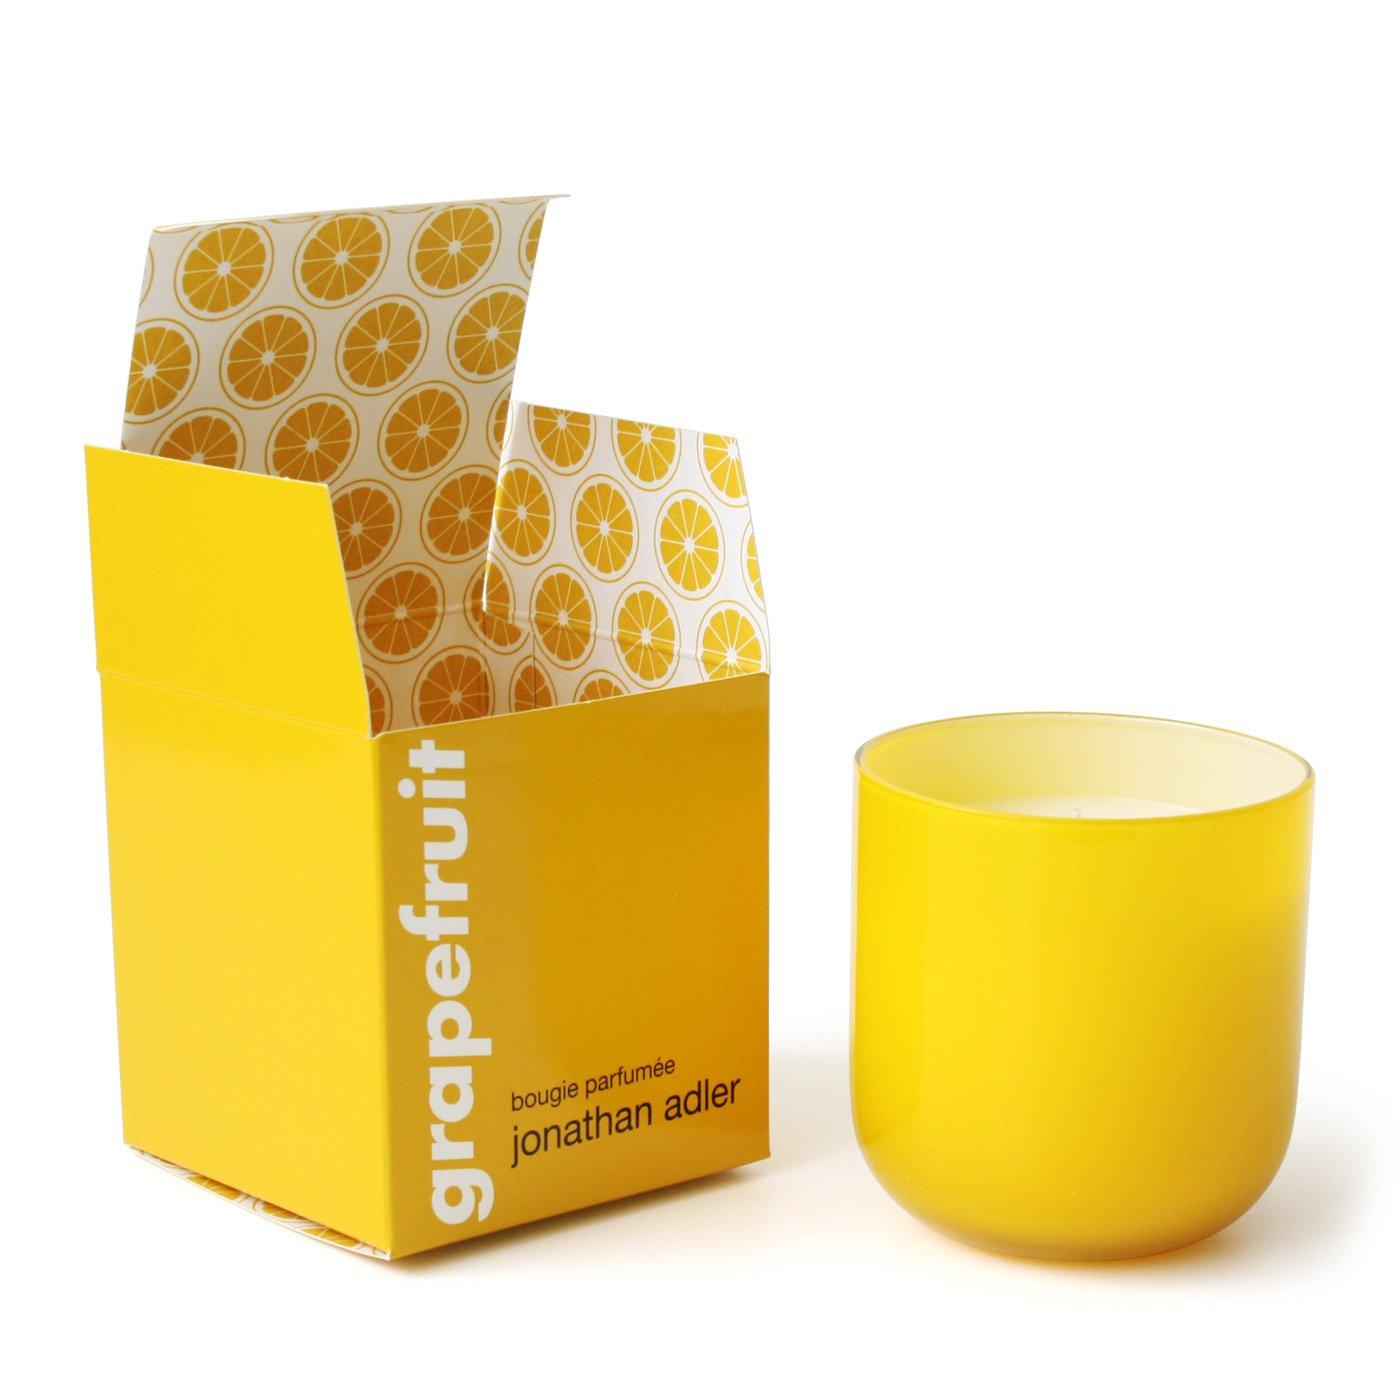 Jonathan Adler Pop Grapefruit Scented Candle, Yellow by Jonathan Adler